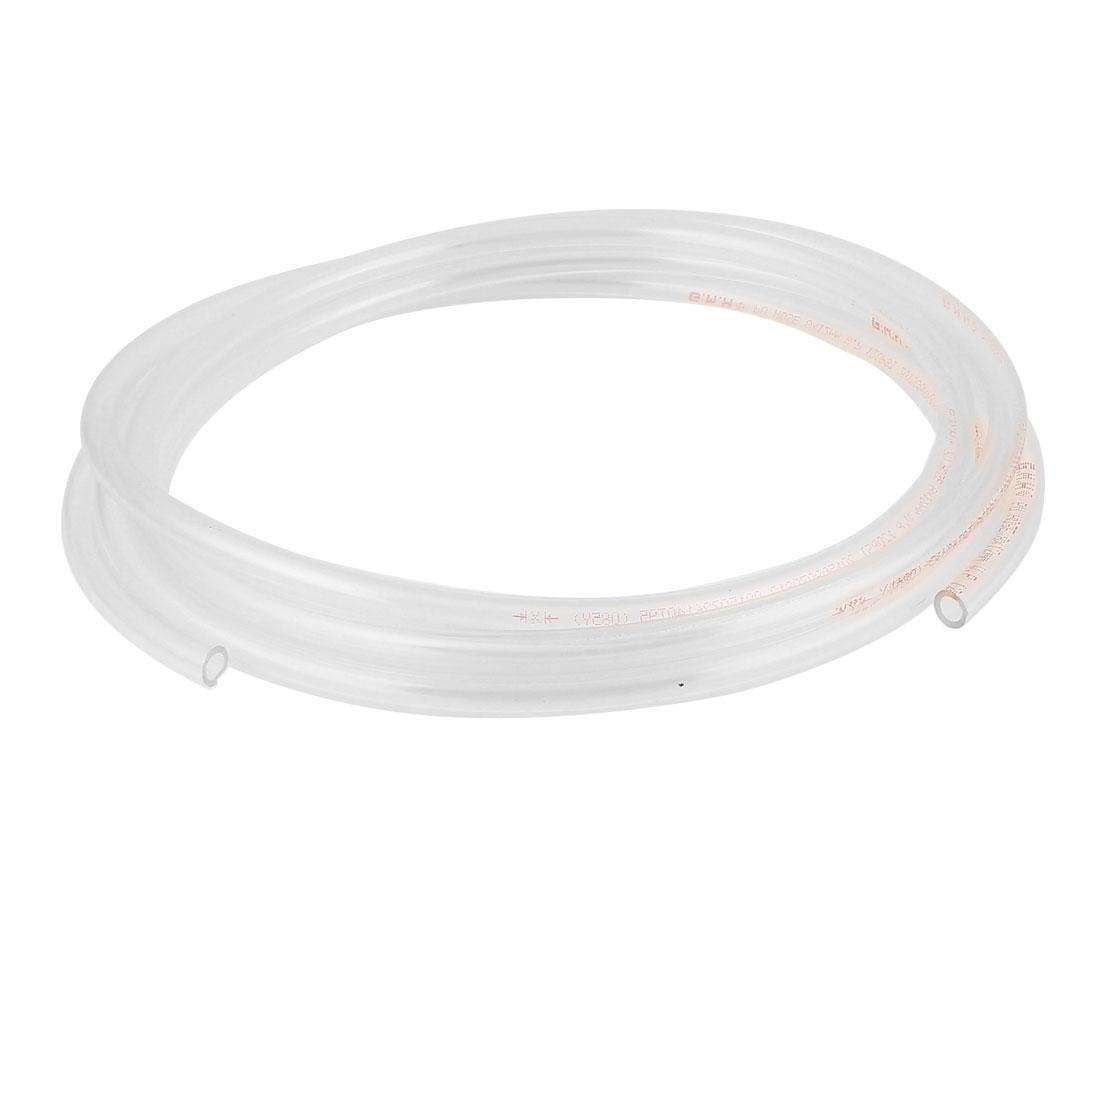 8mm x 12mm Clear Fleaxible PU Tube Pneumatic Polyurethane Hose 4M Length